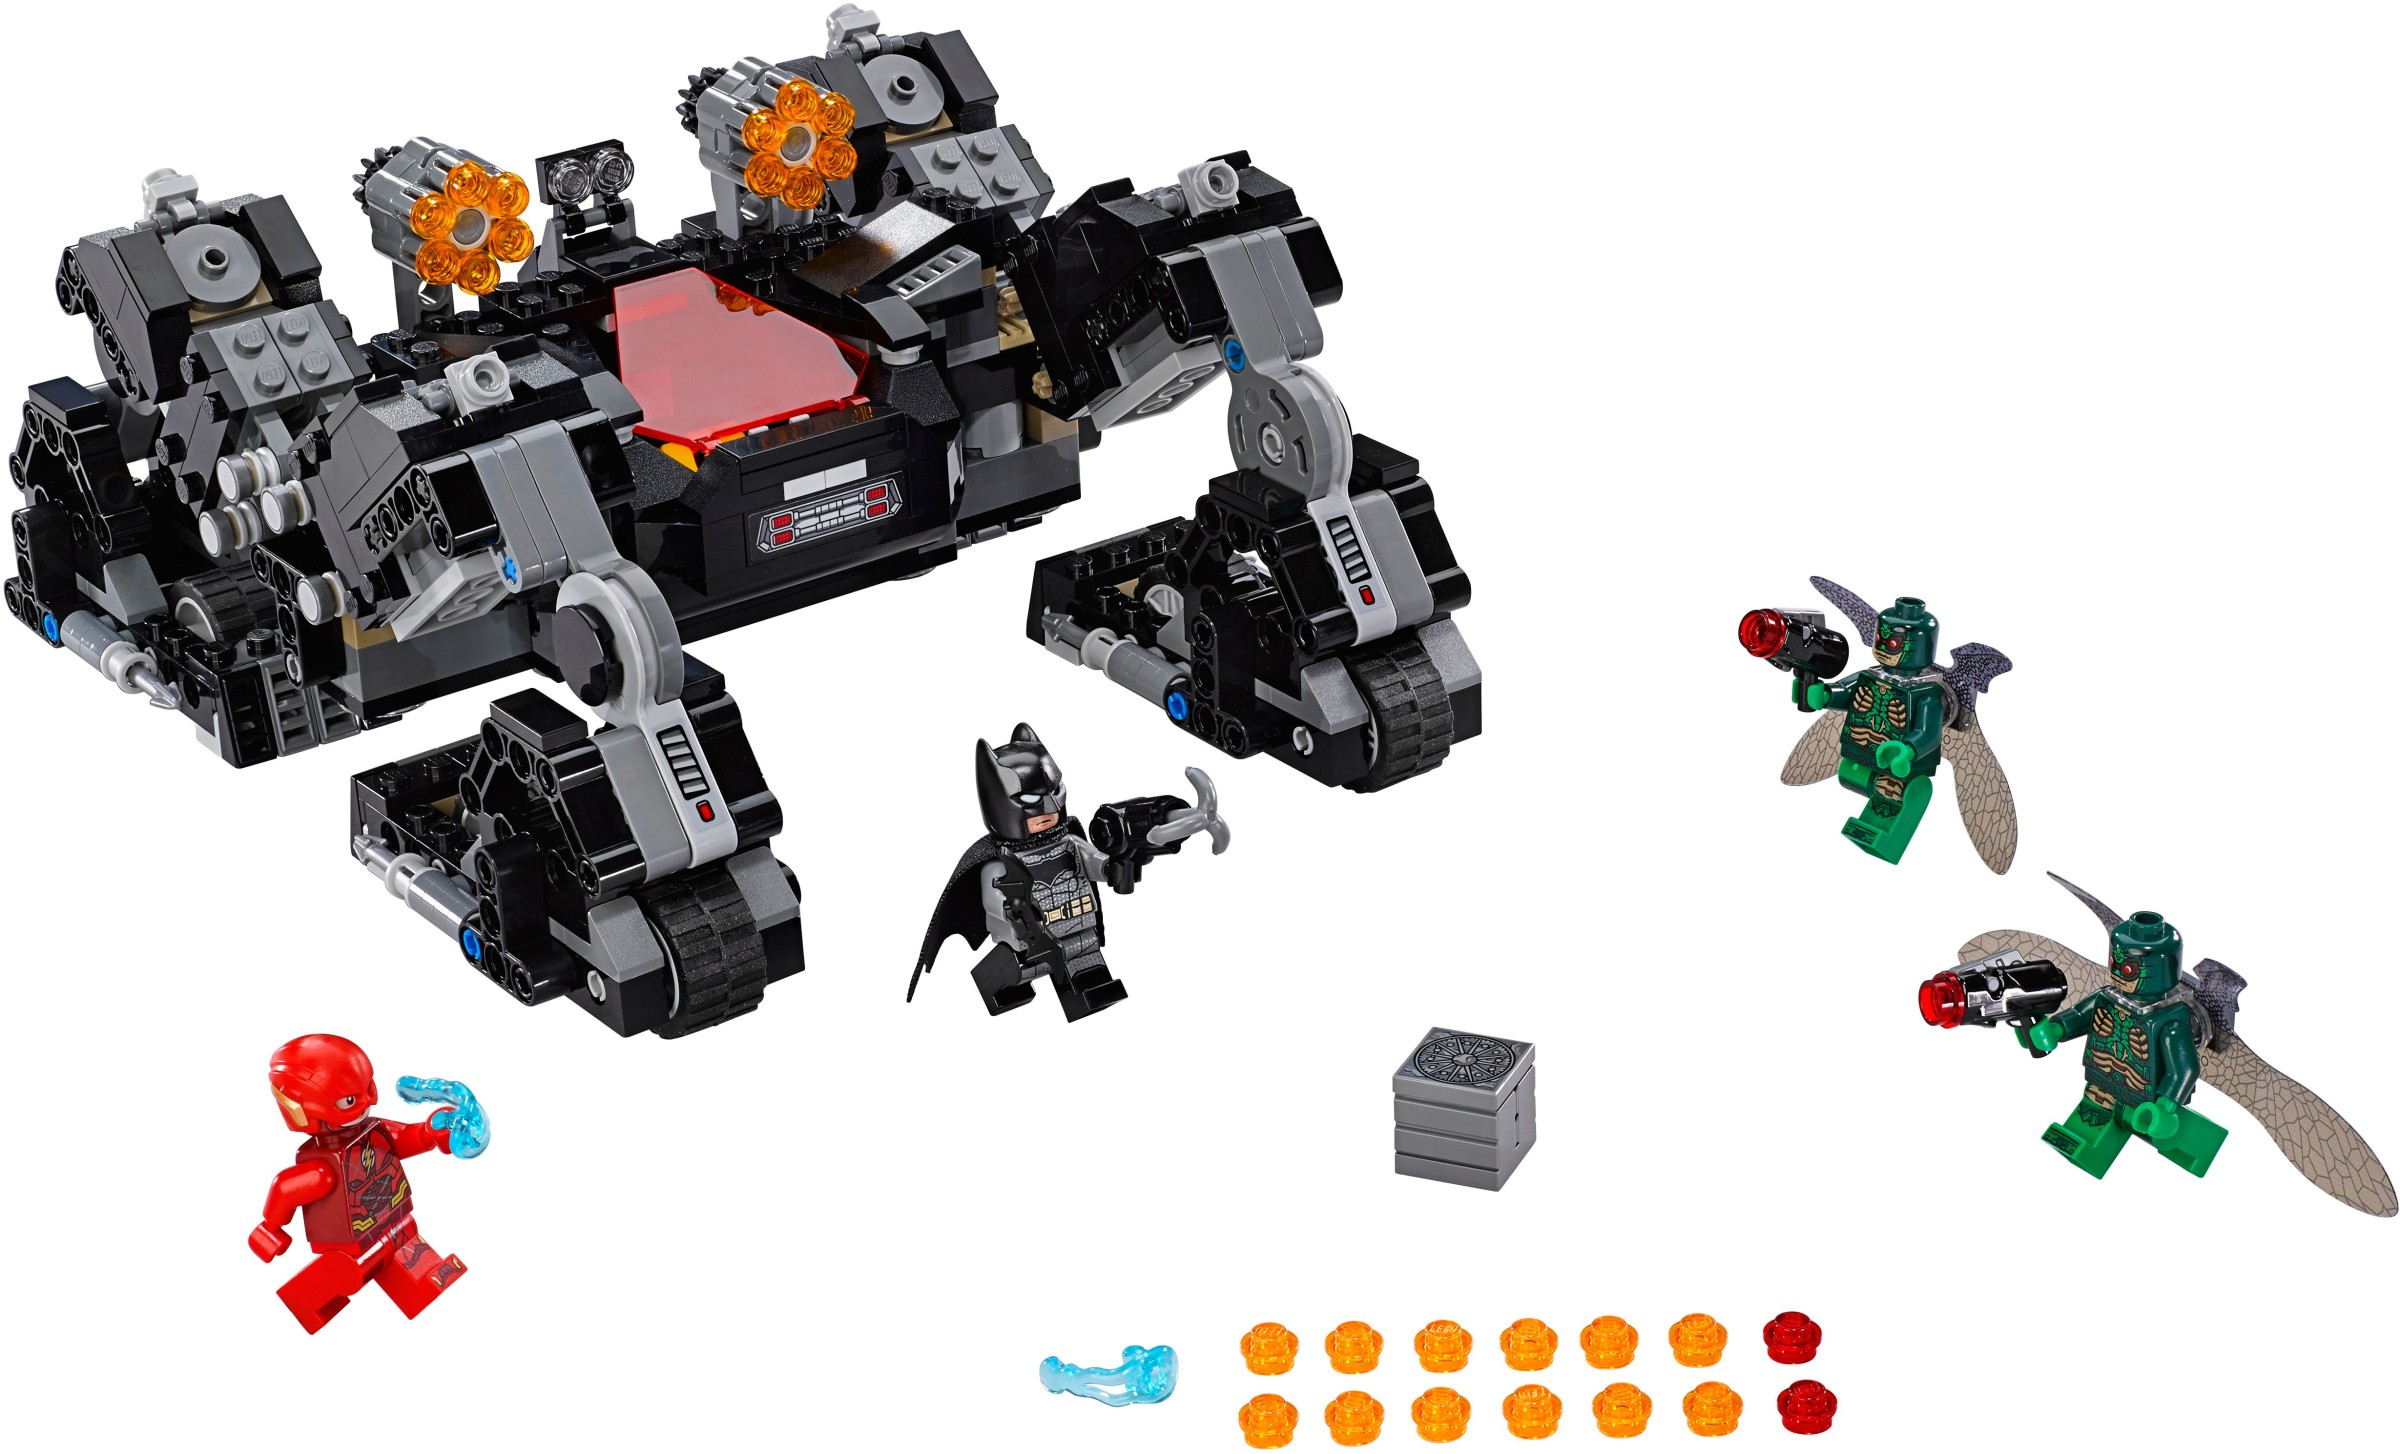 Dc Comics Super Heroes 2017 Brickset Lego Set Guide And Database